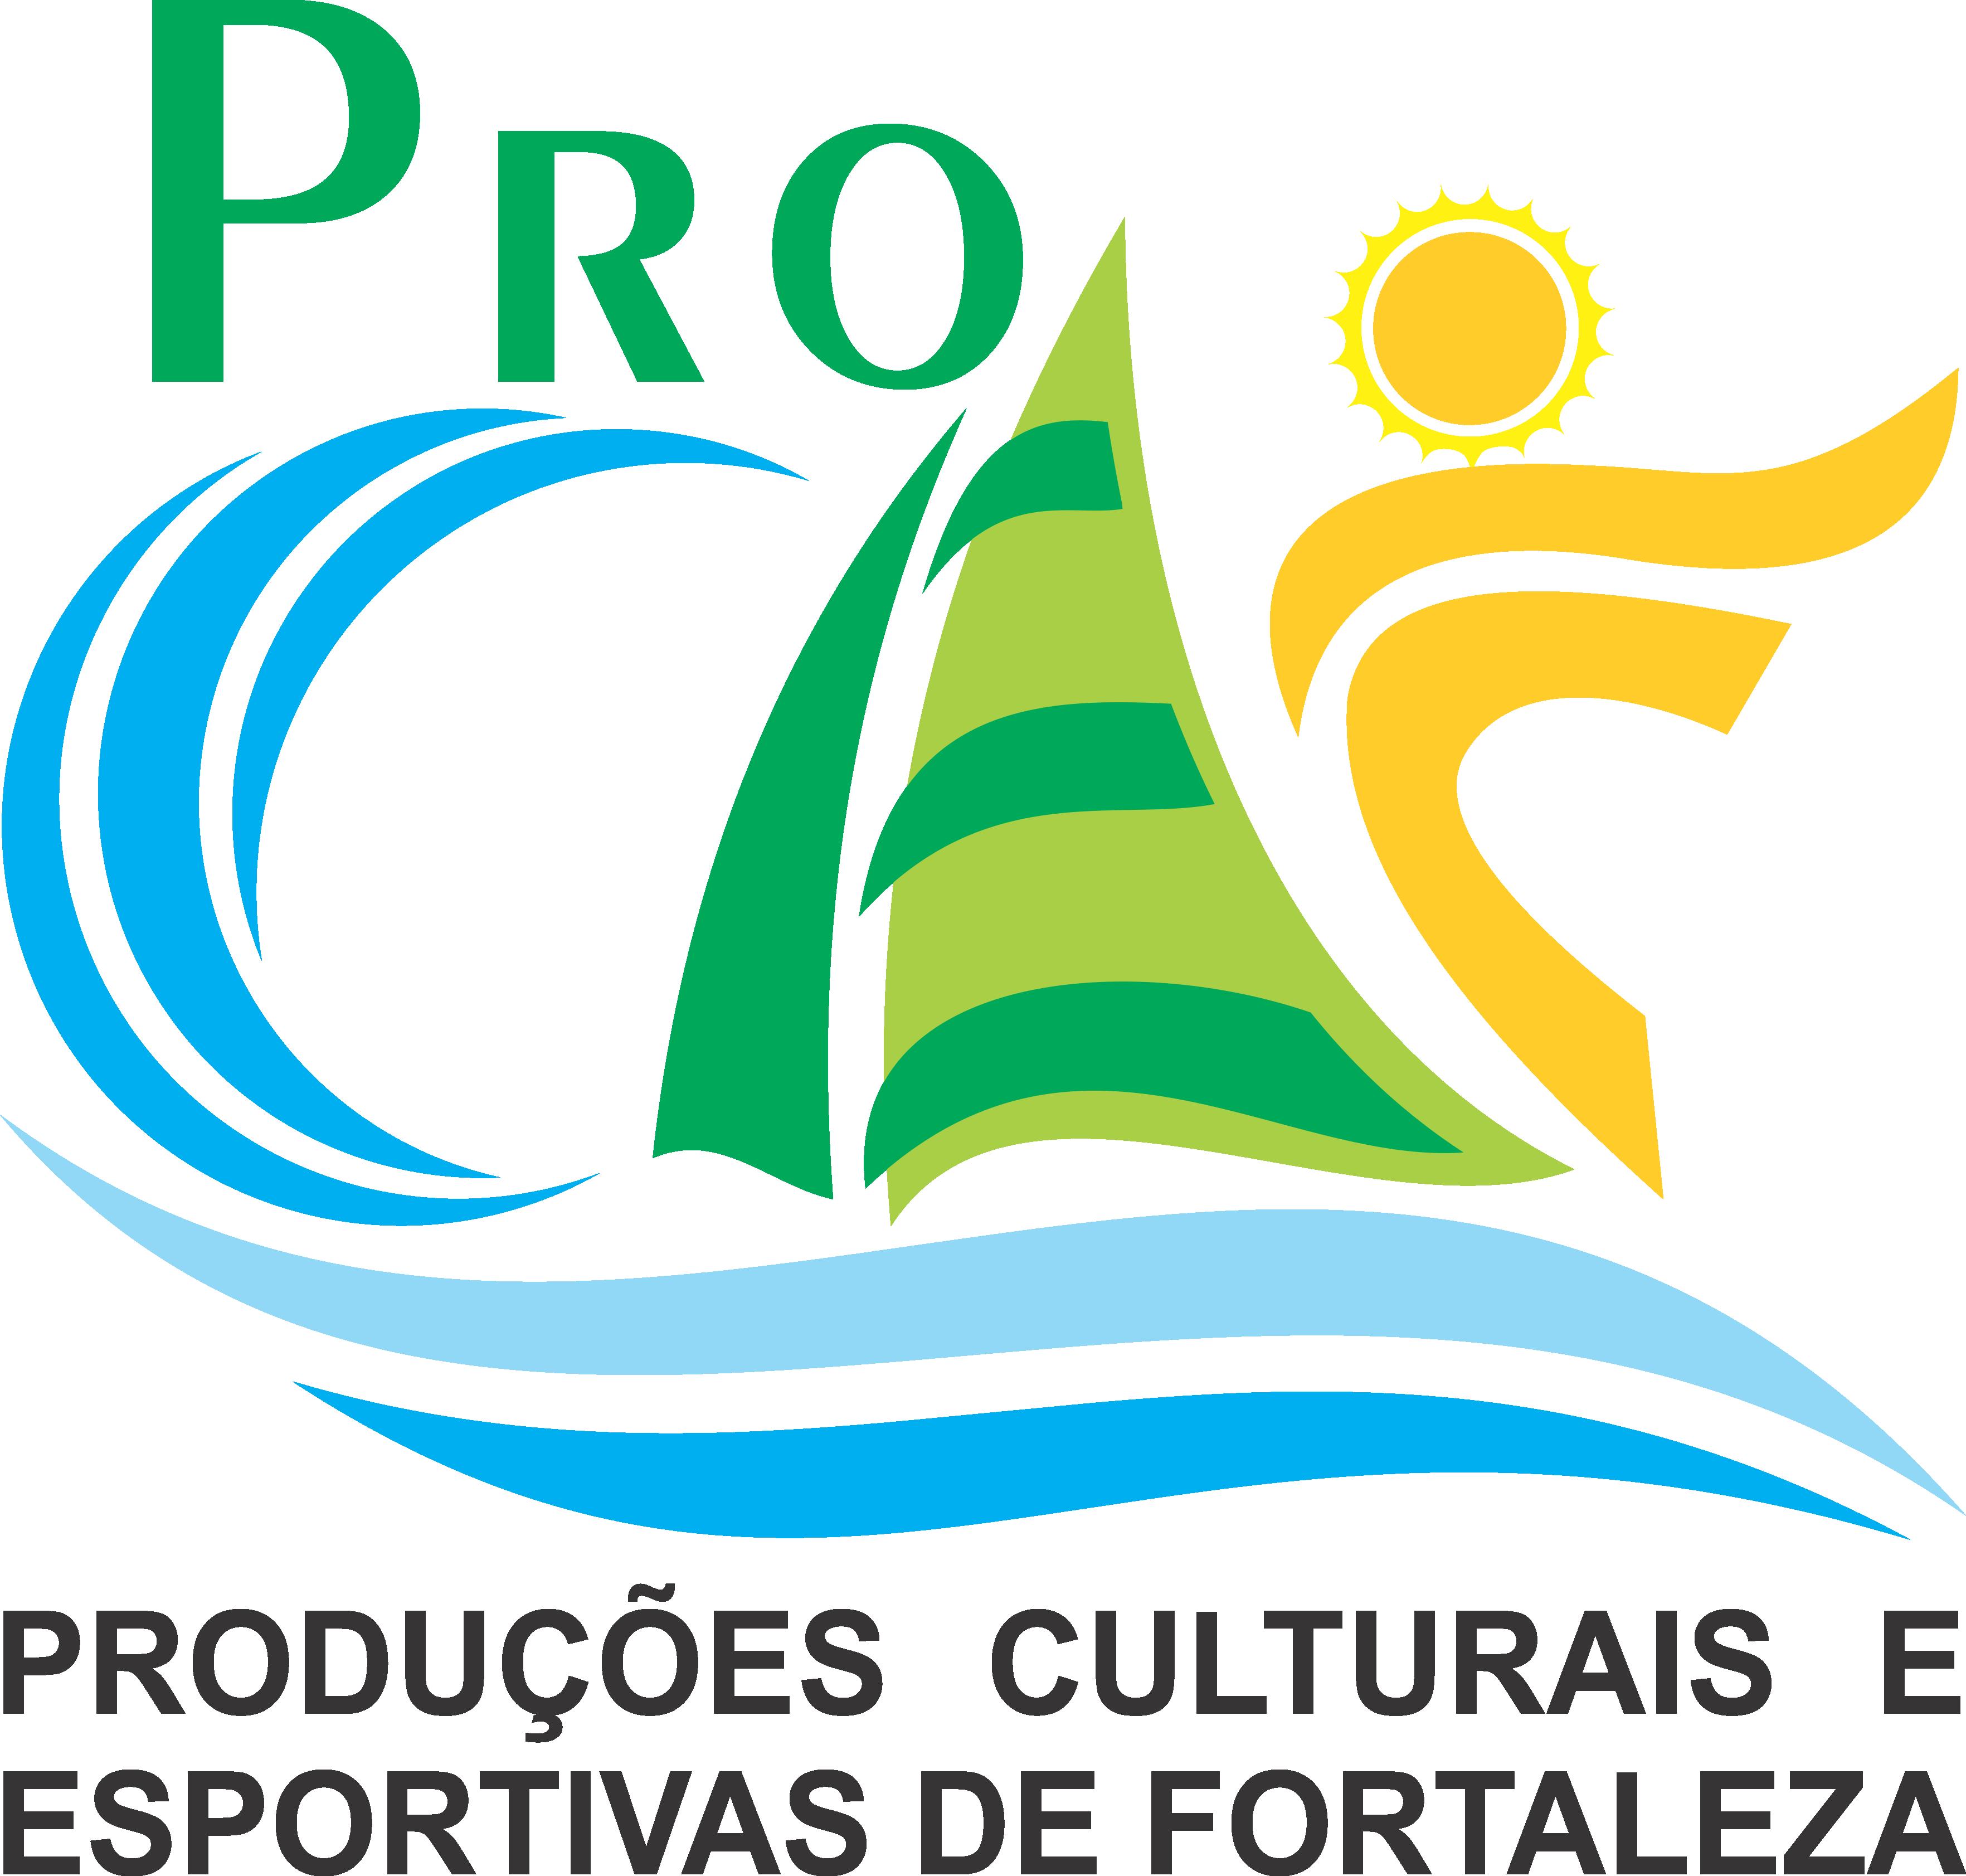 Logomarca PROCEF (Produções Culturais e Esportivas de Fortaleza)